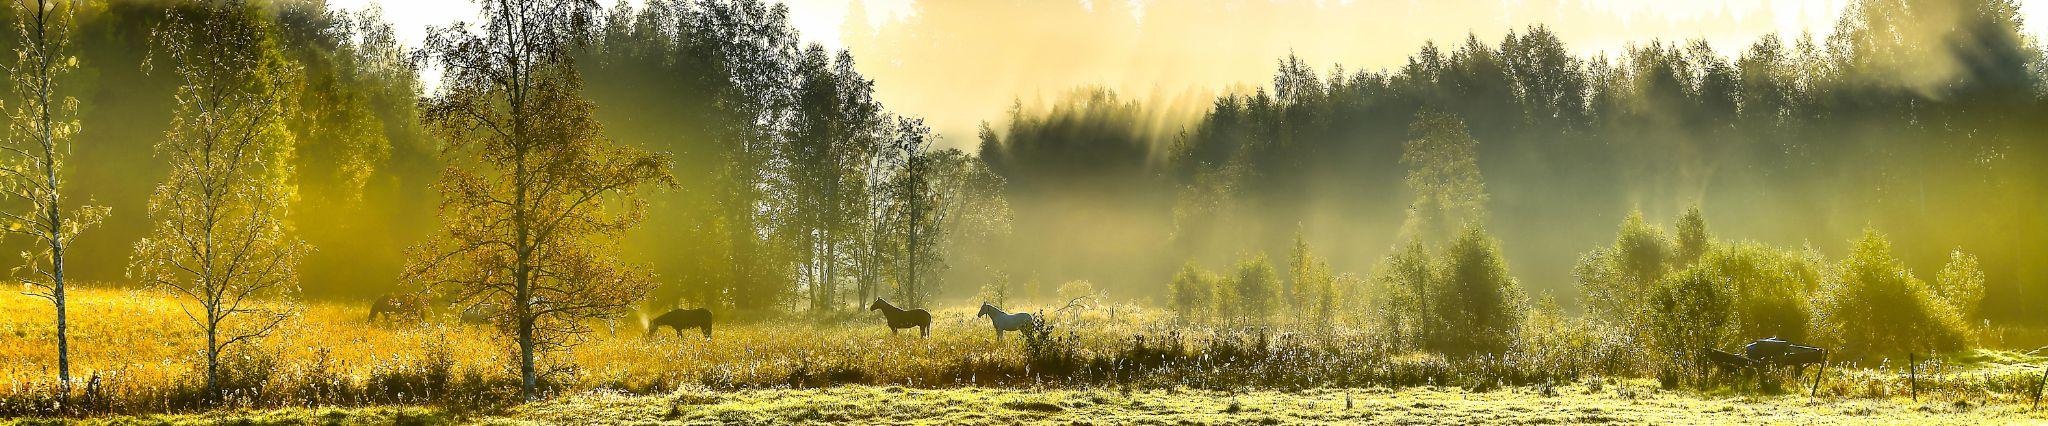 horses panorama by Håkan Lindkvist